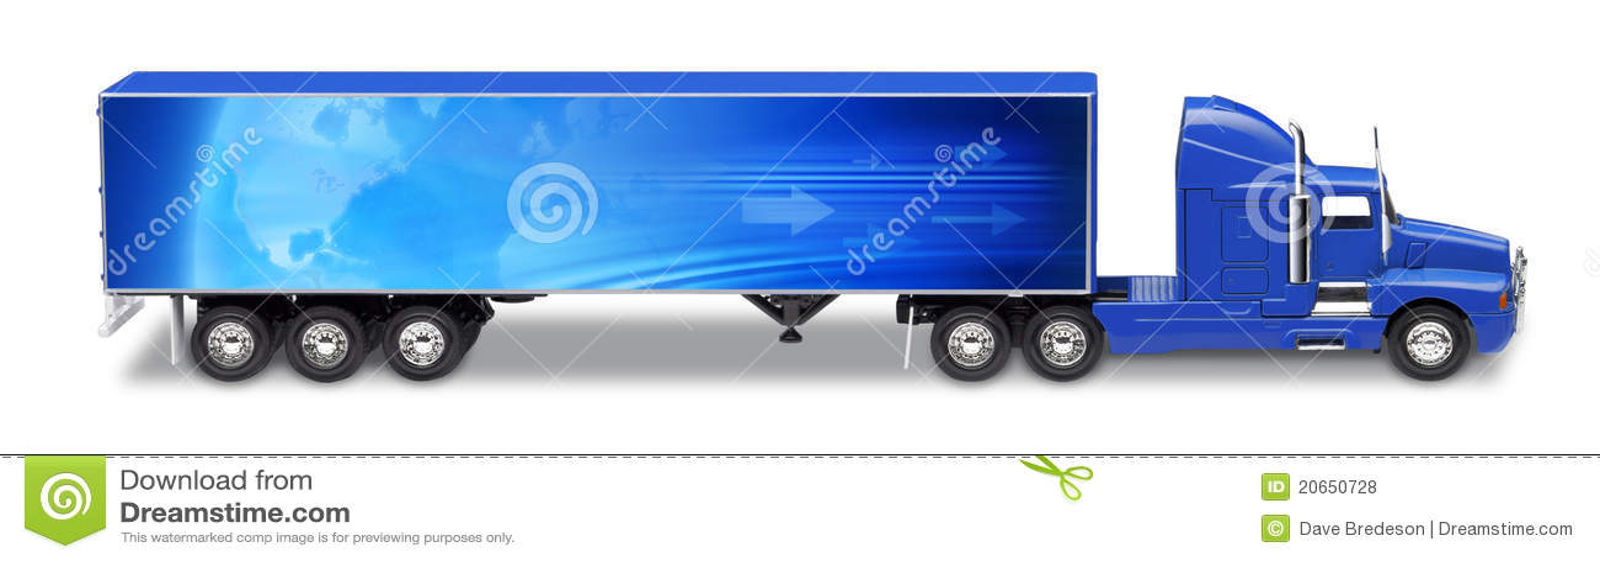 Camion de semi remorque de transport photos libres de - Dessin de camion semi remorque ...